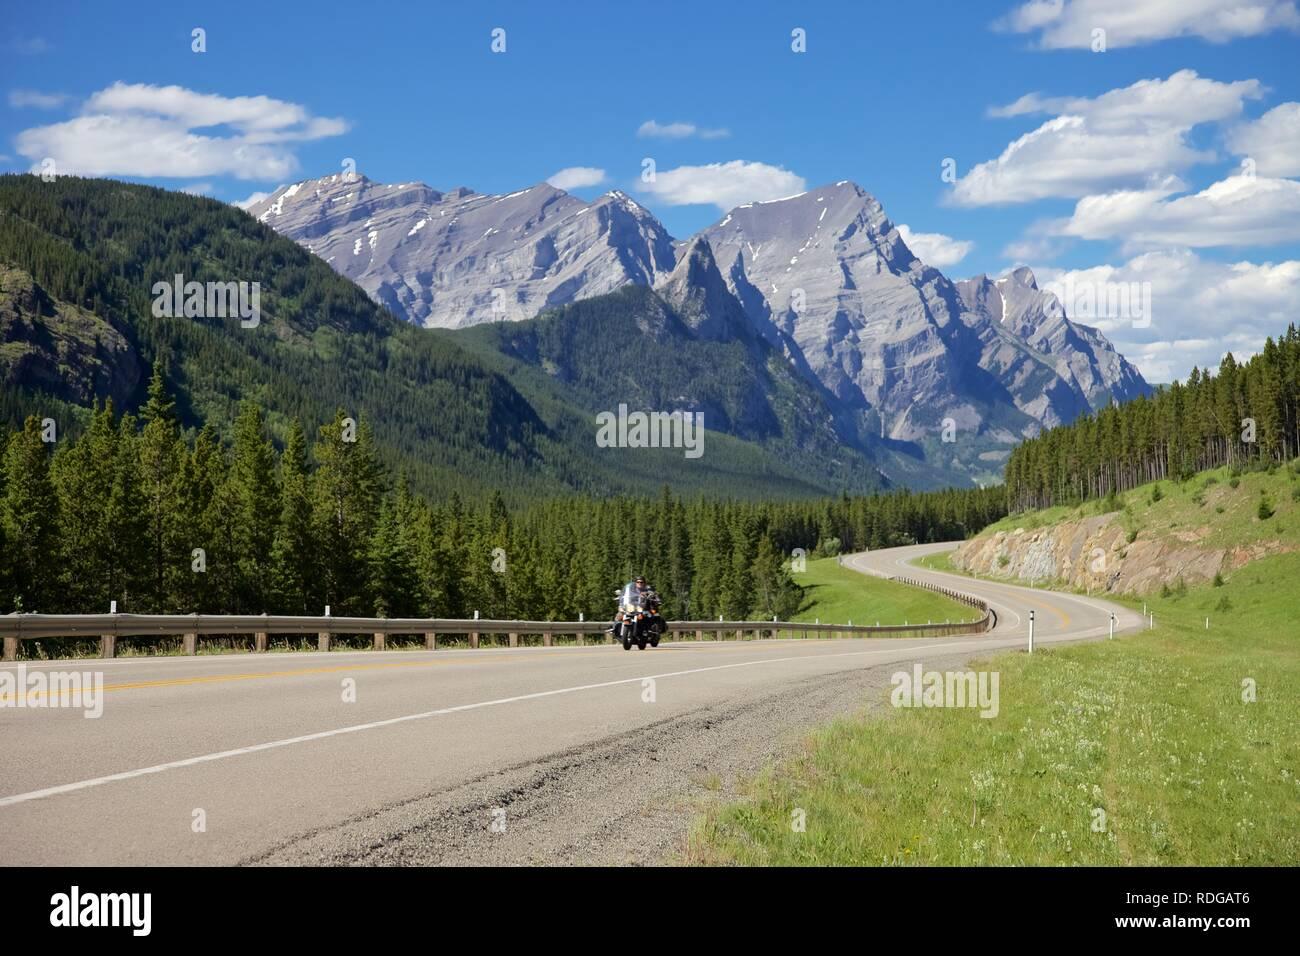 Route 40 Scenic Highway Alberta - Stock Image